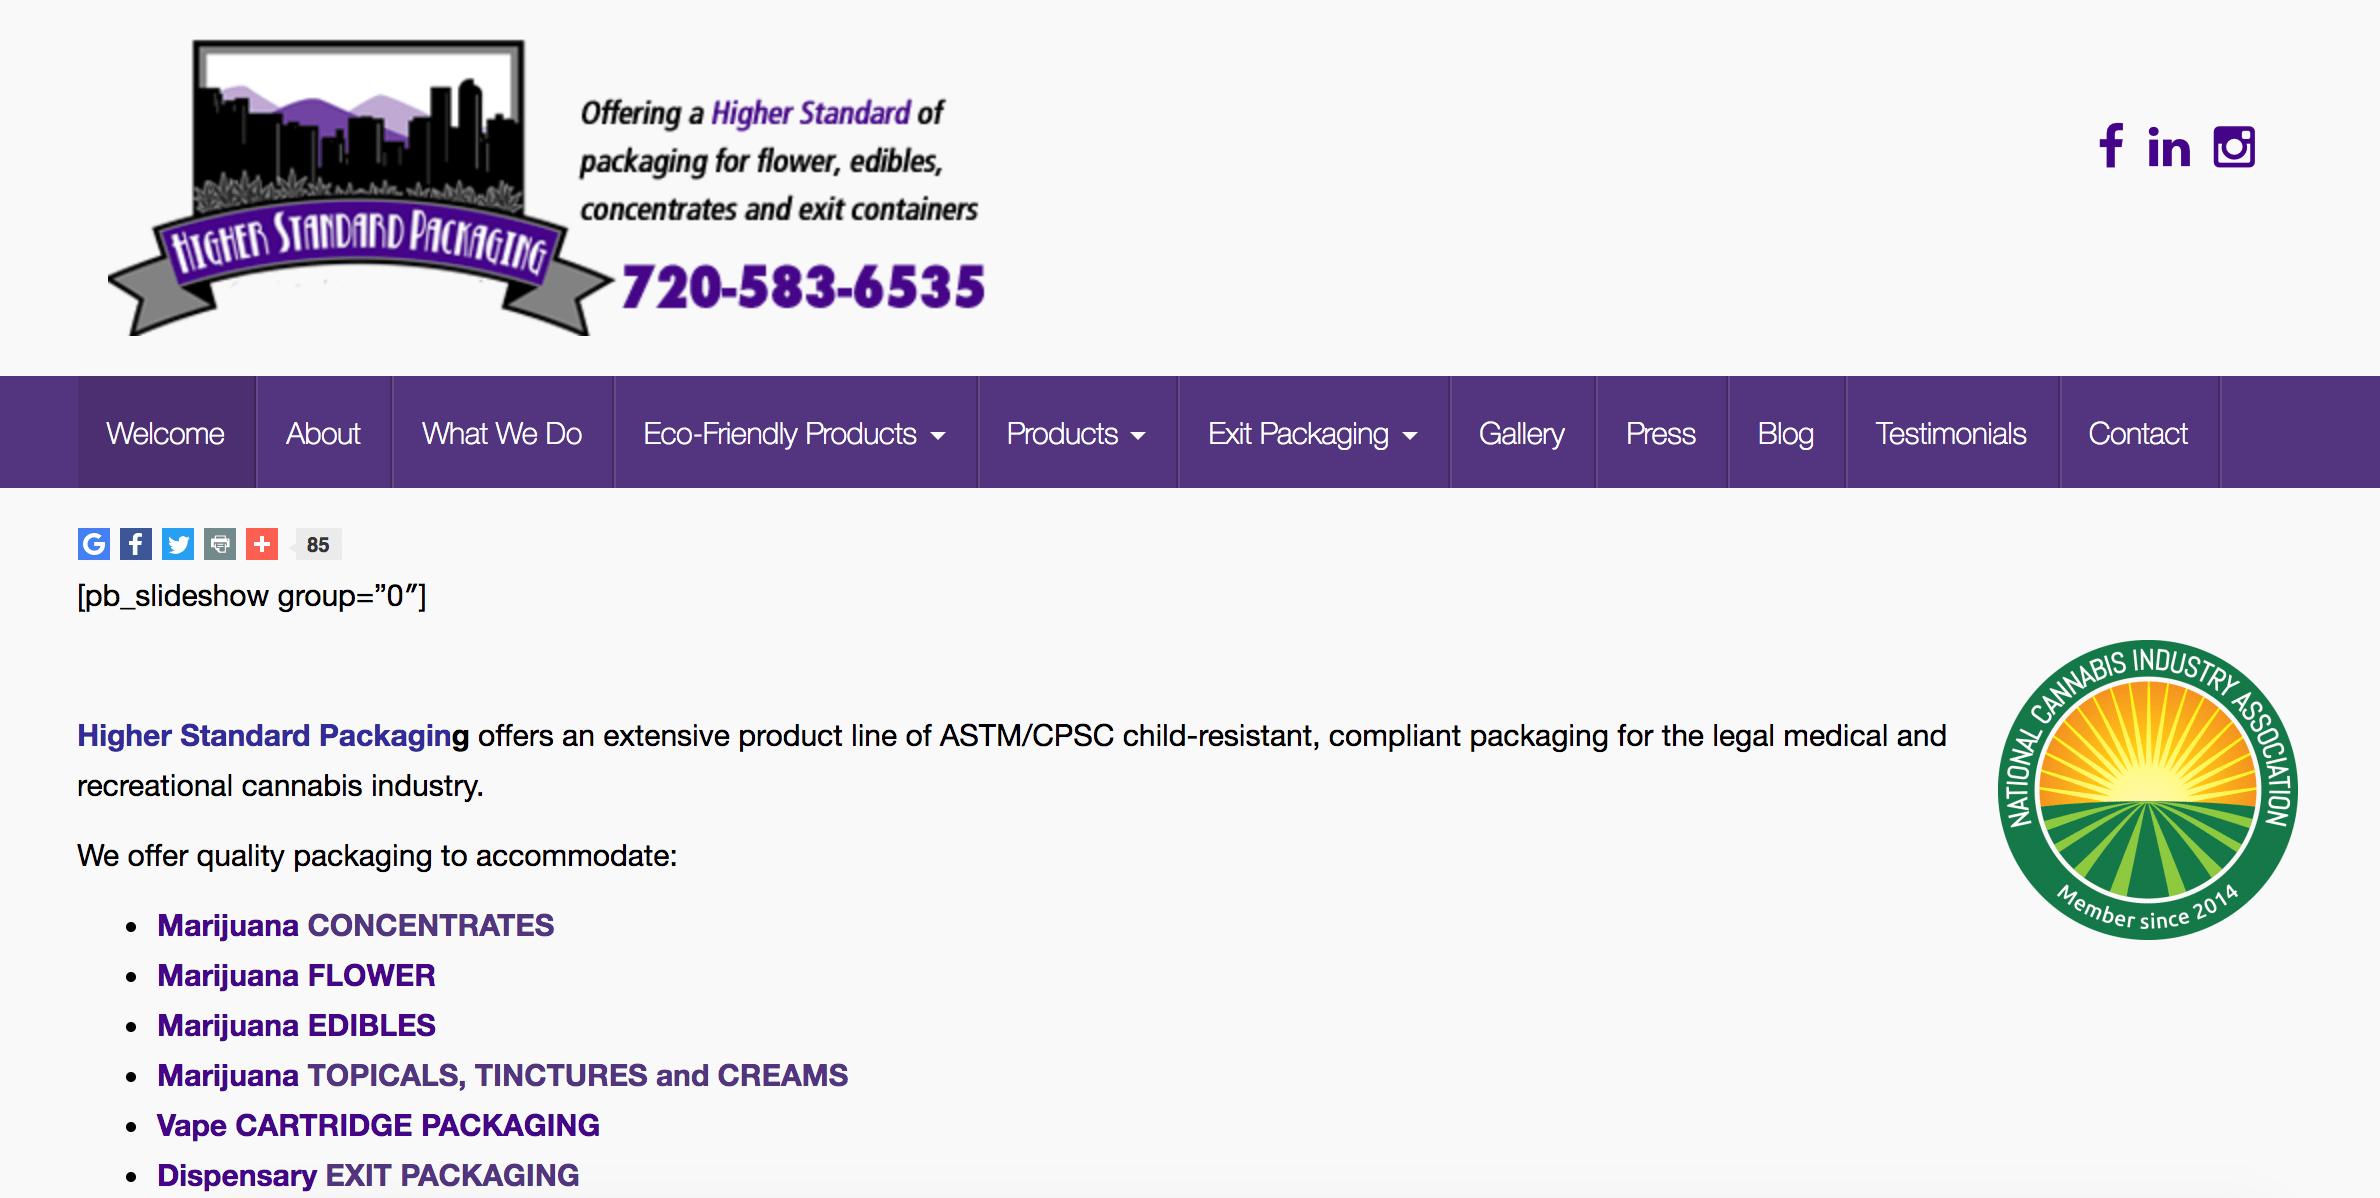 Higher Standard website